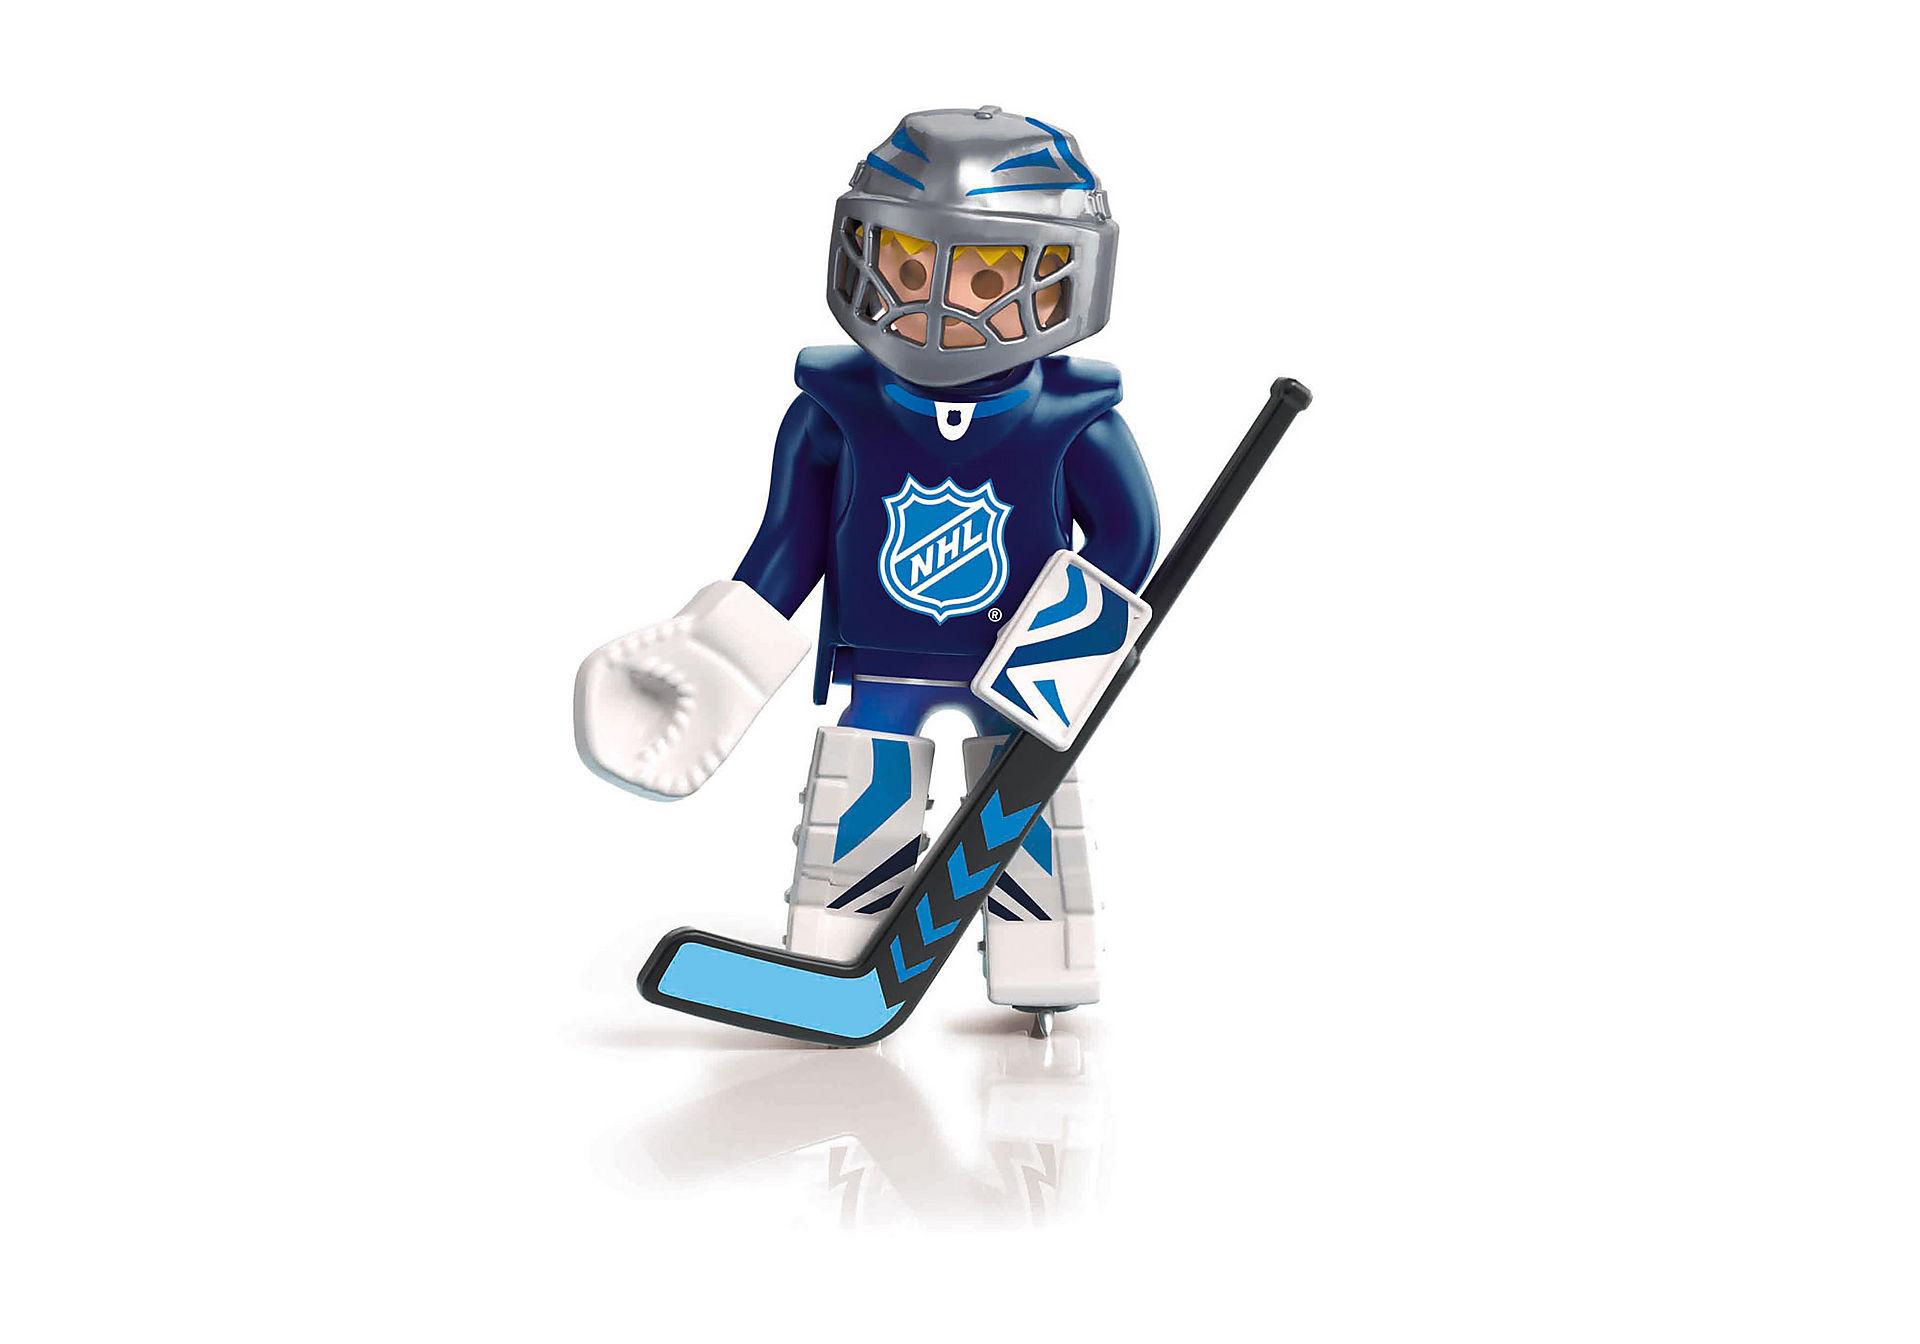 9293 NHL™ Take Along Arena zoom image7